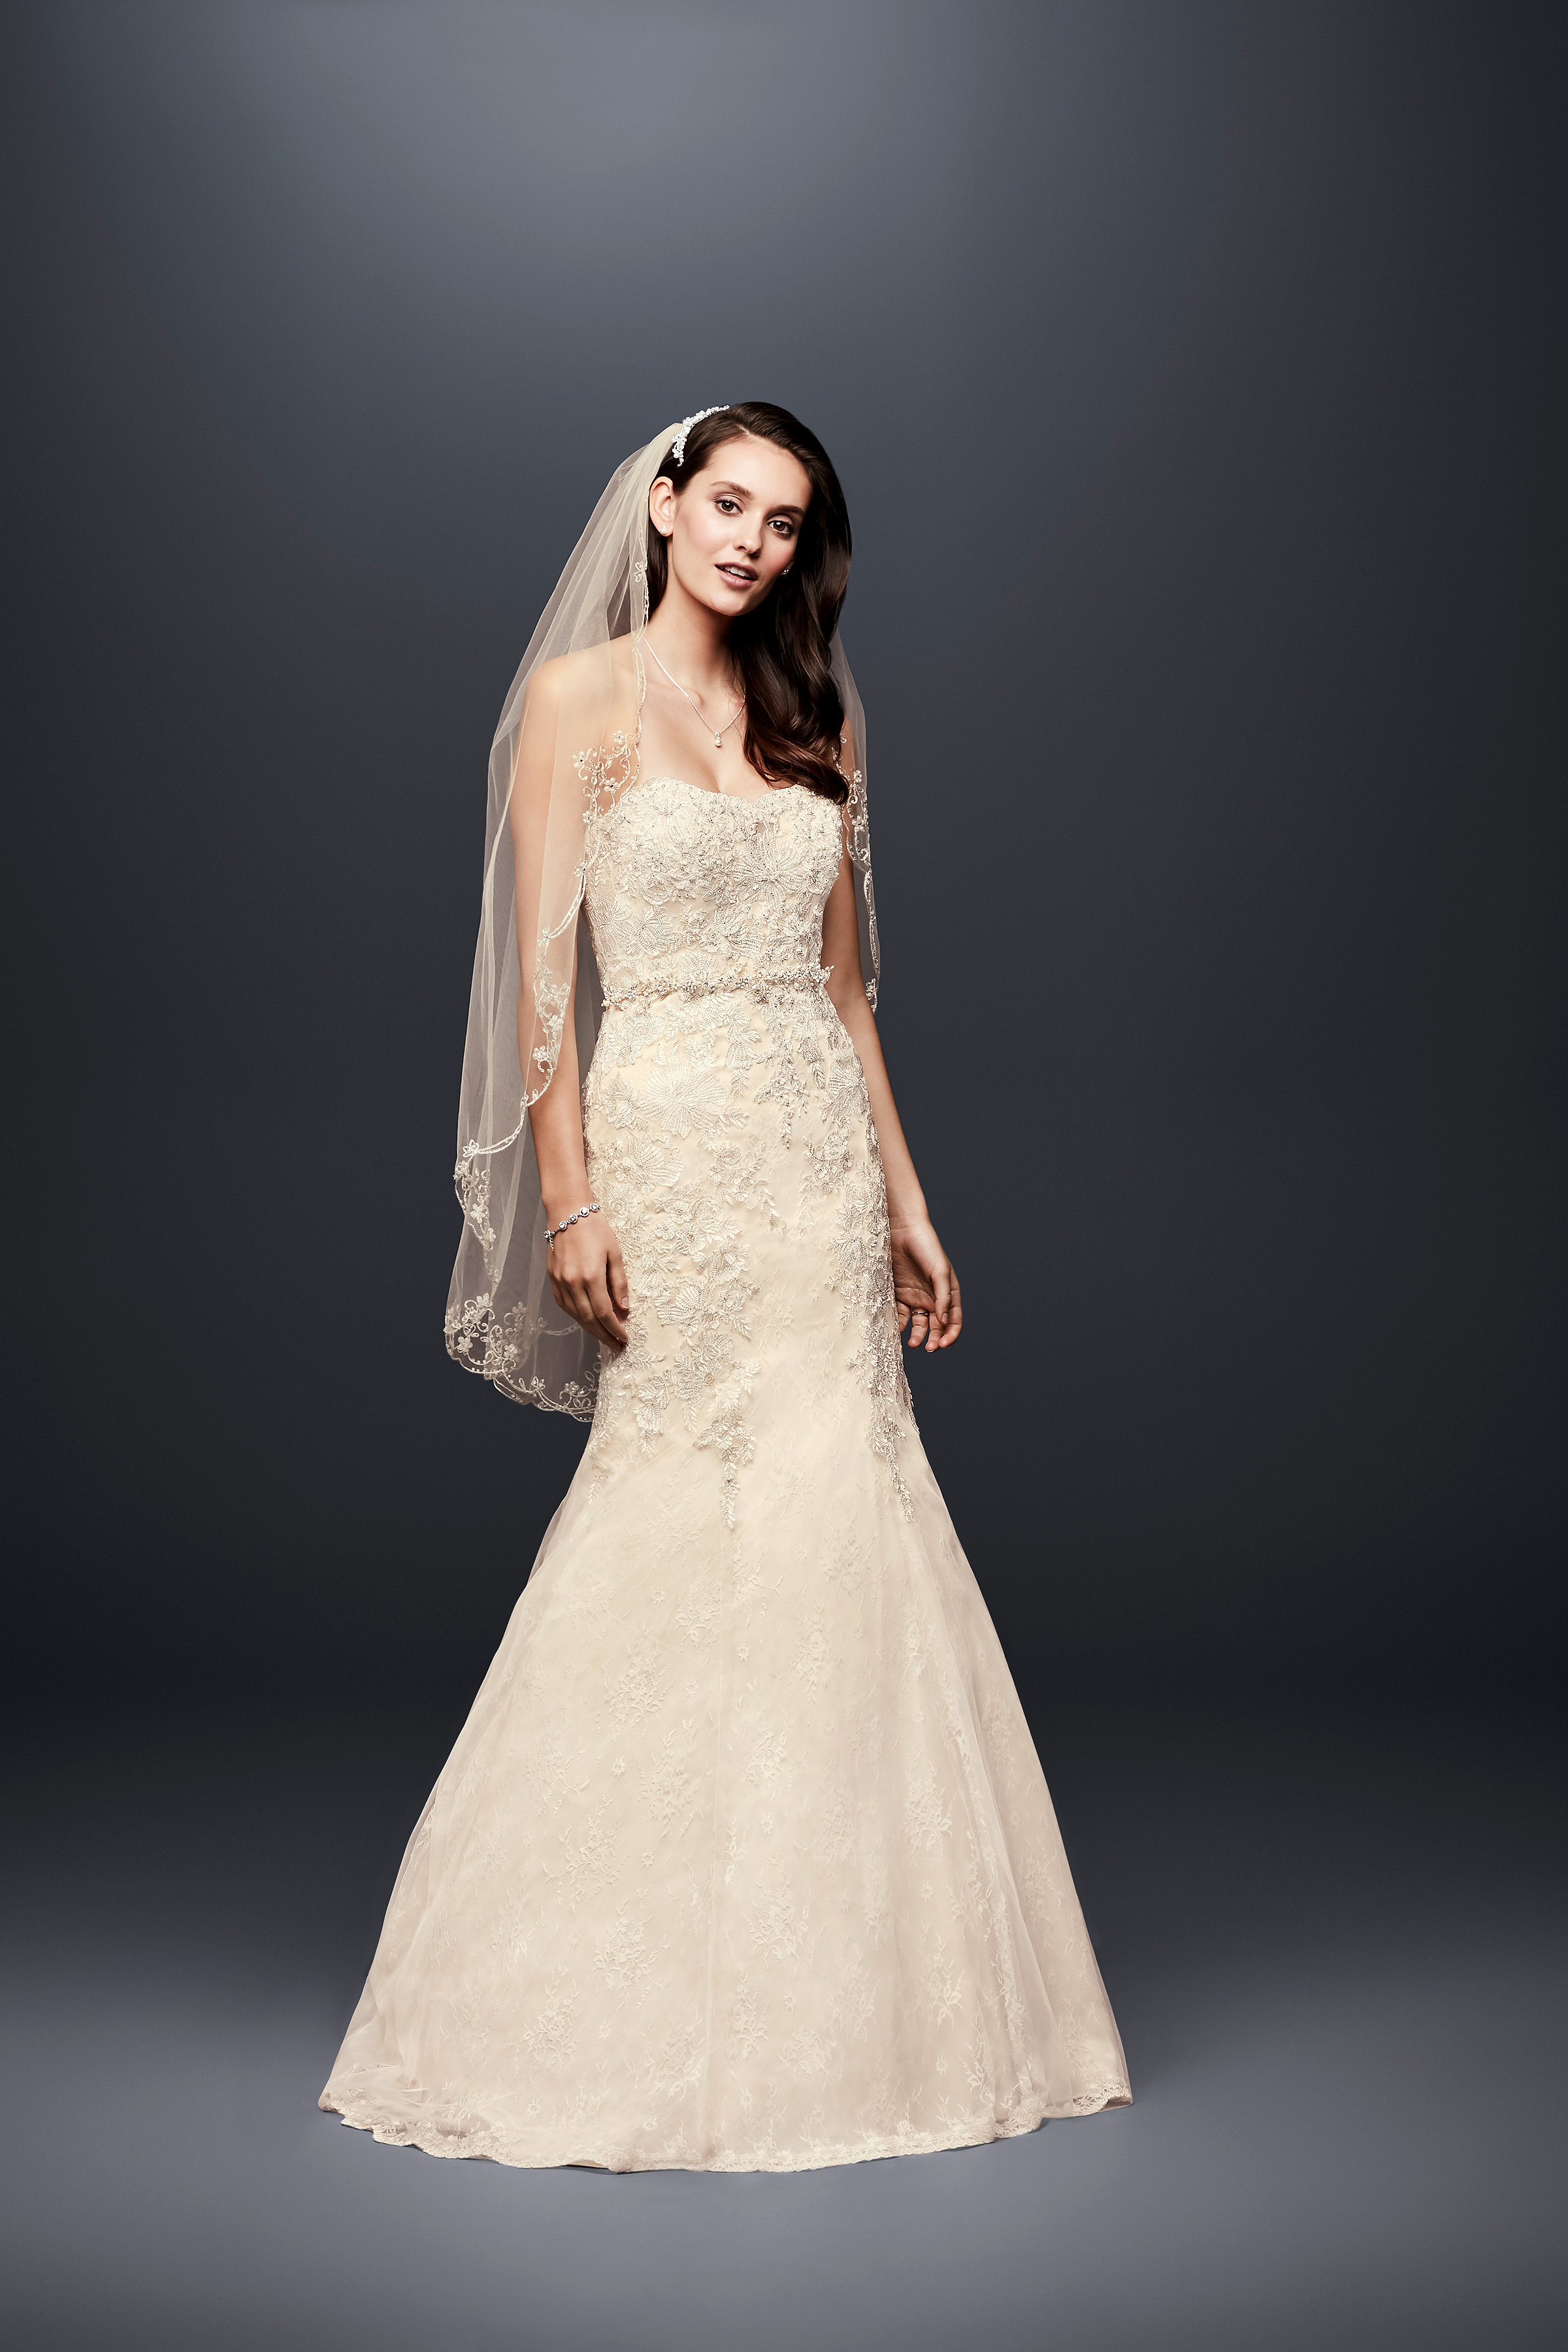 david bridal wedding dress spring 2019 strapless off white trumpet